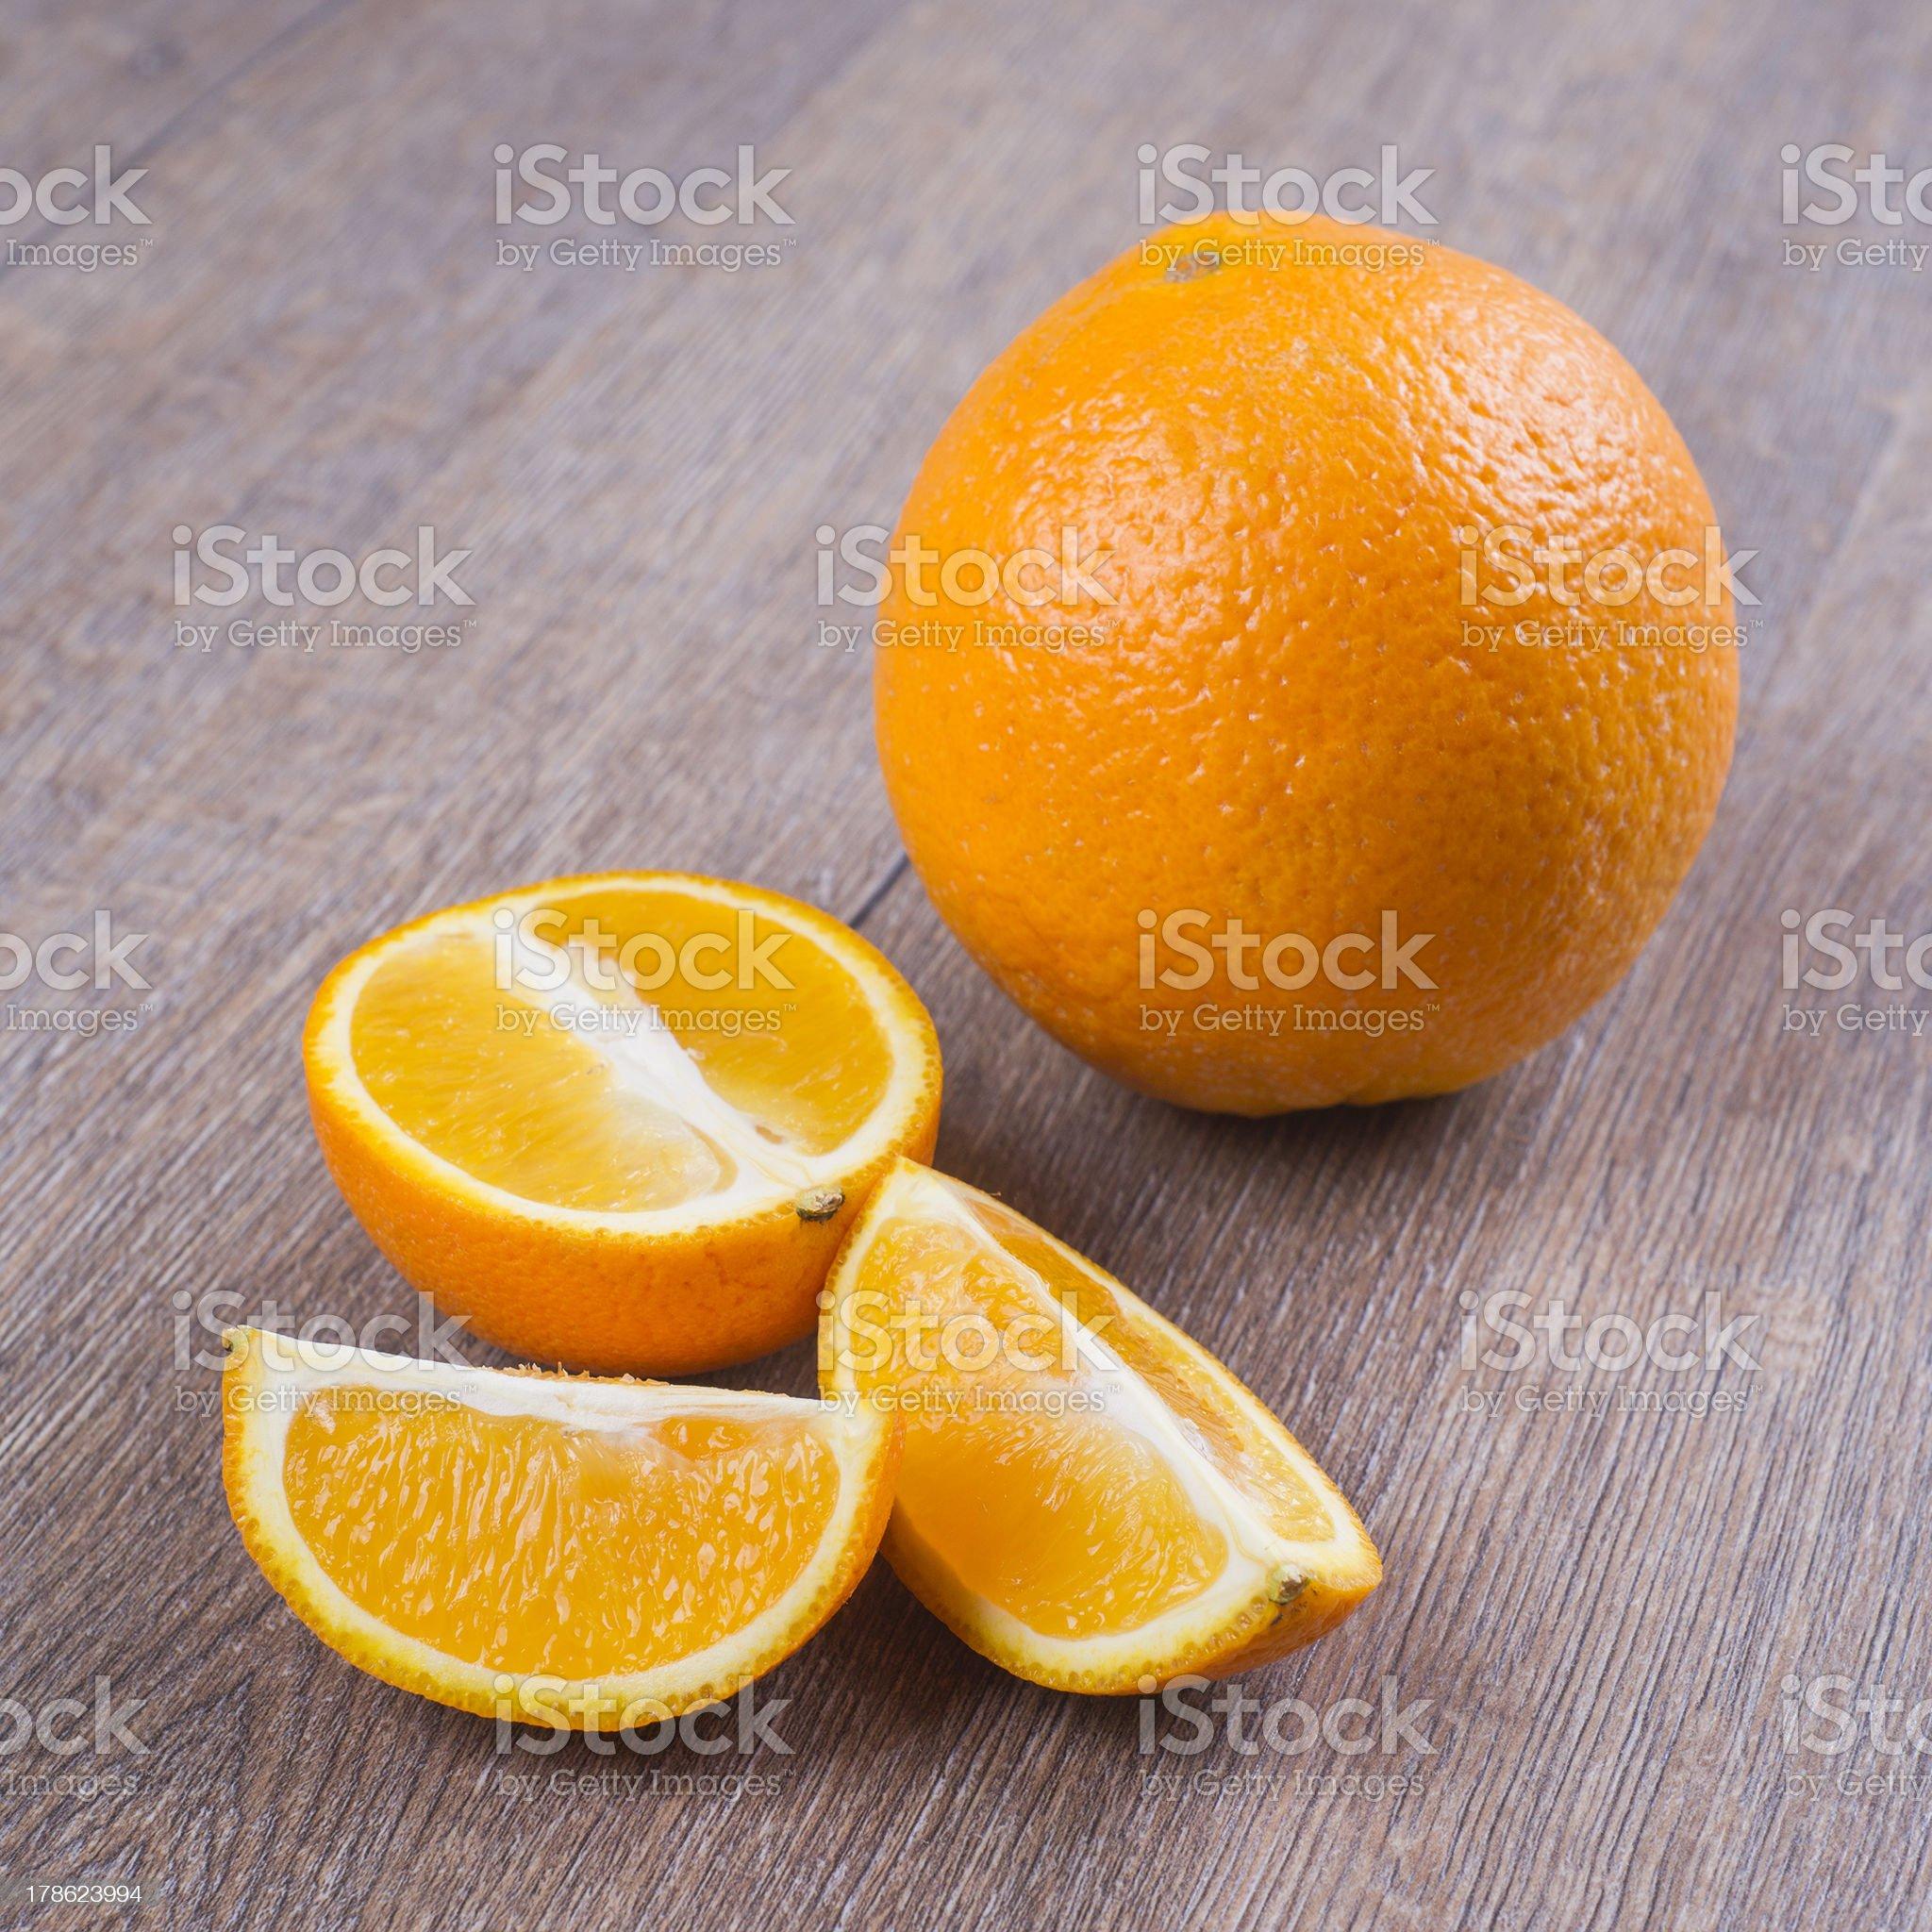 Orange fruits on the table royalty-free stock photo